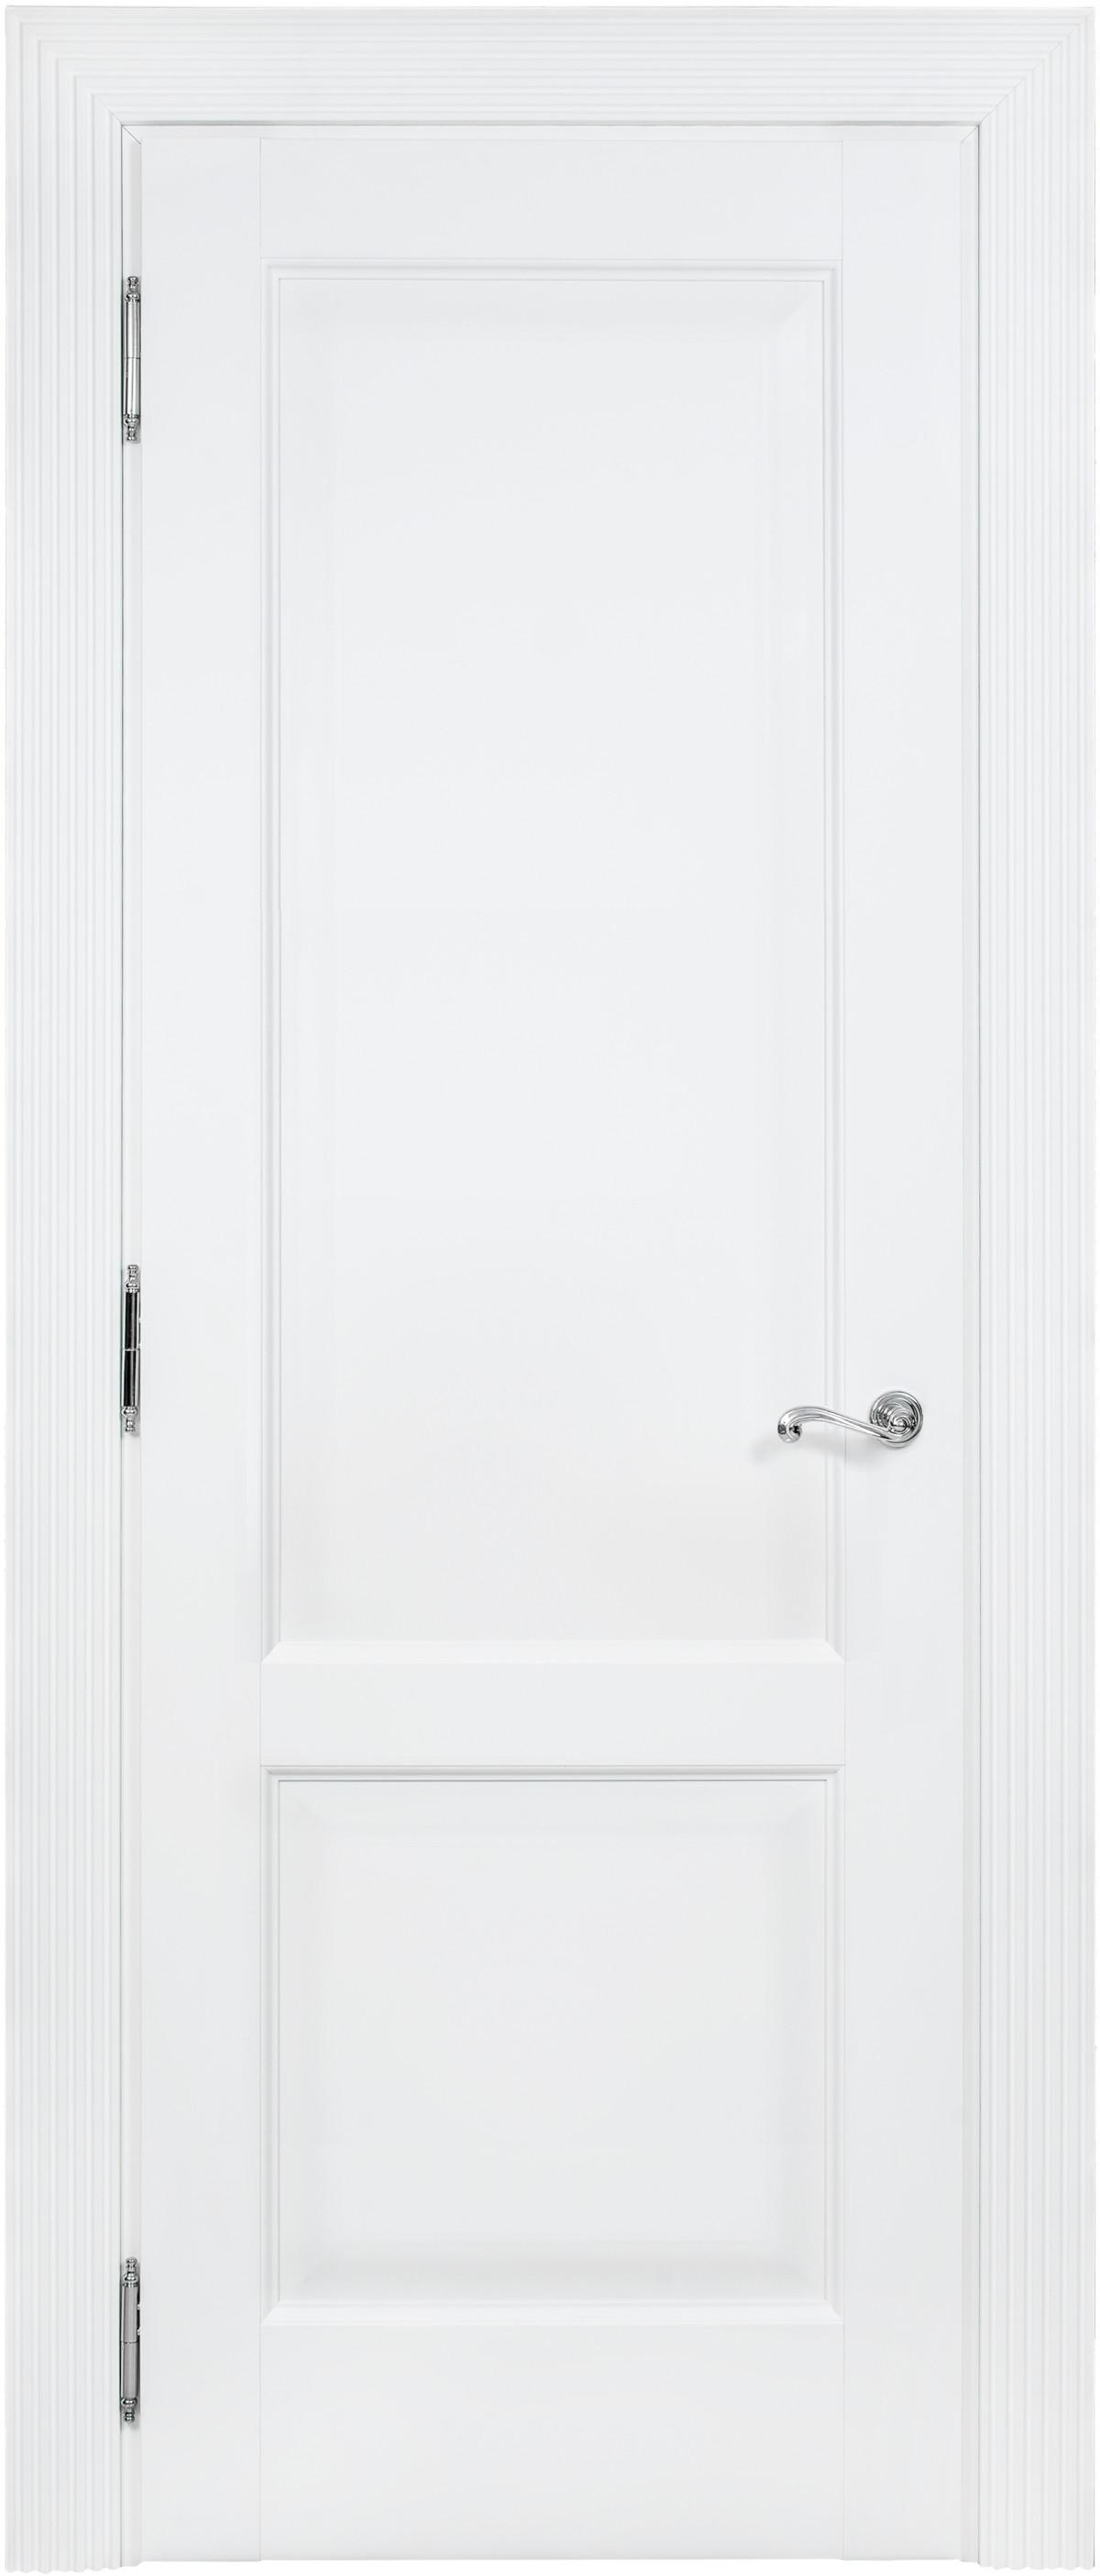 Белая межкомнатная дверь Academia 2F